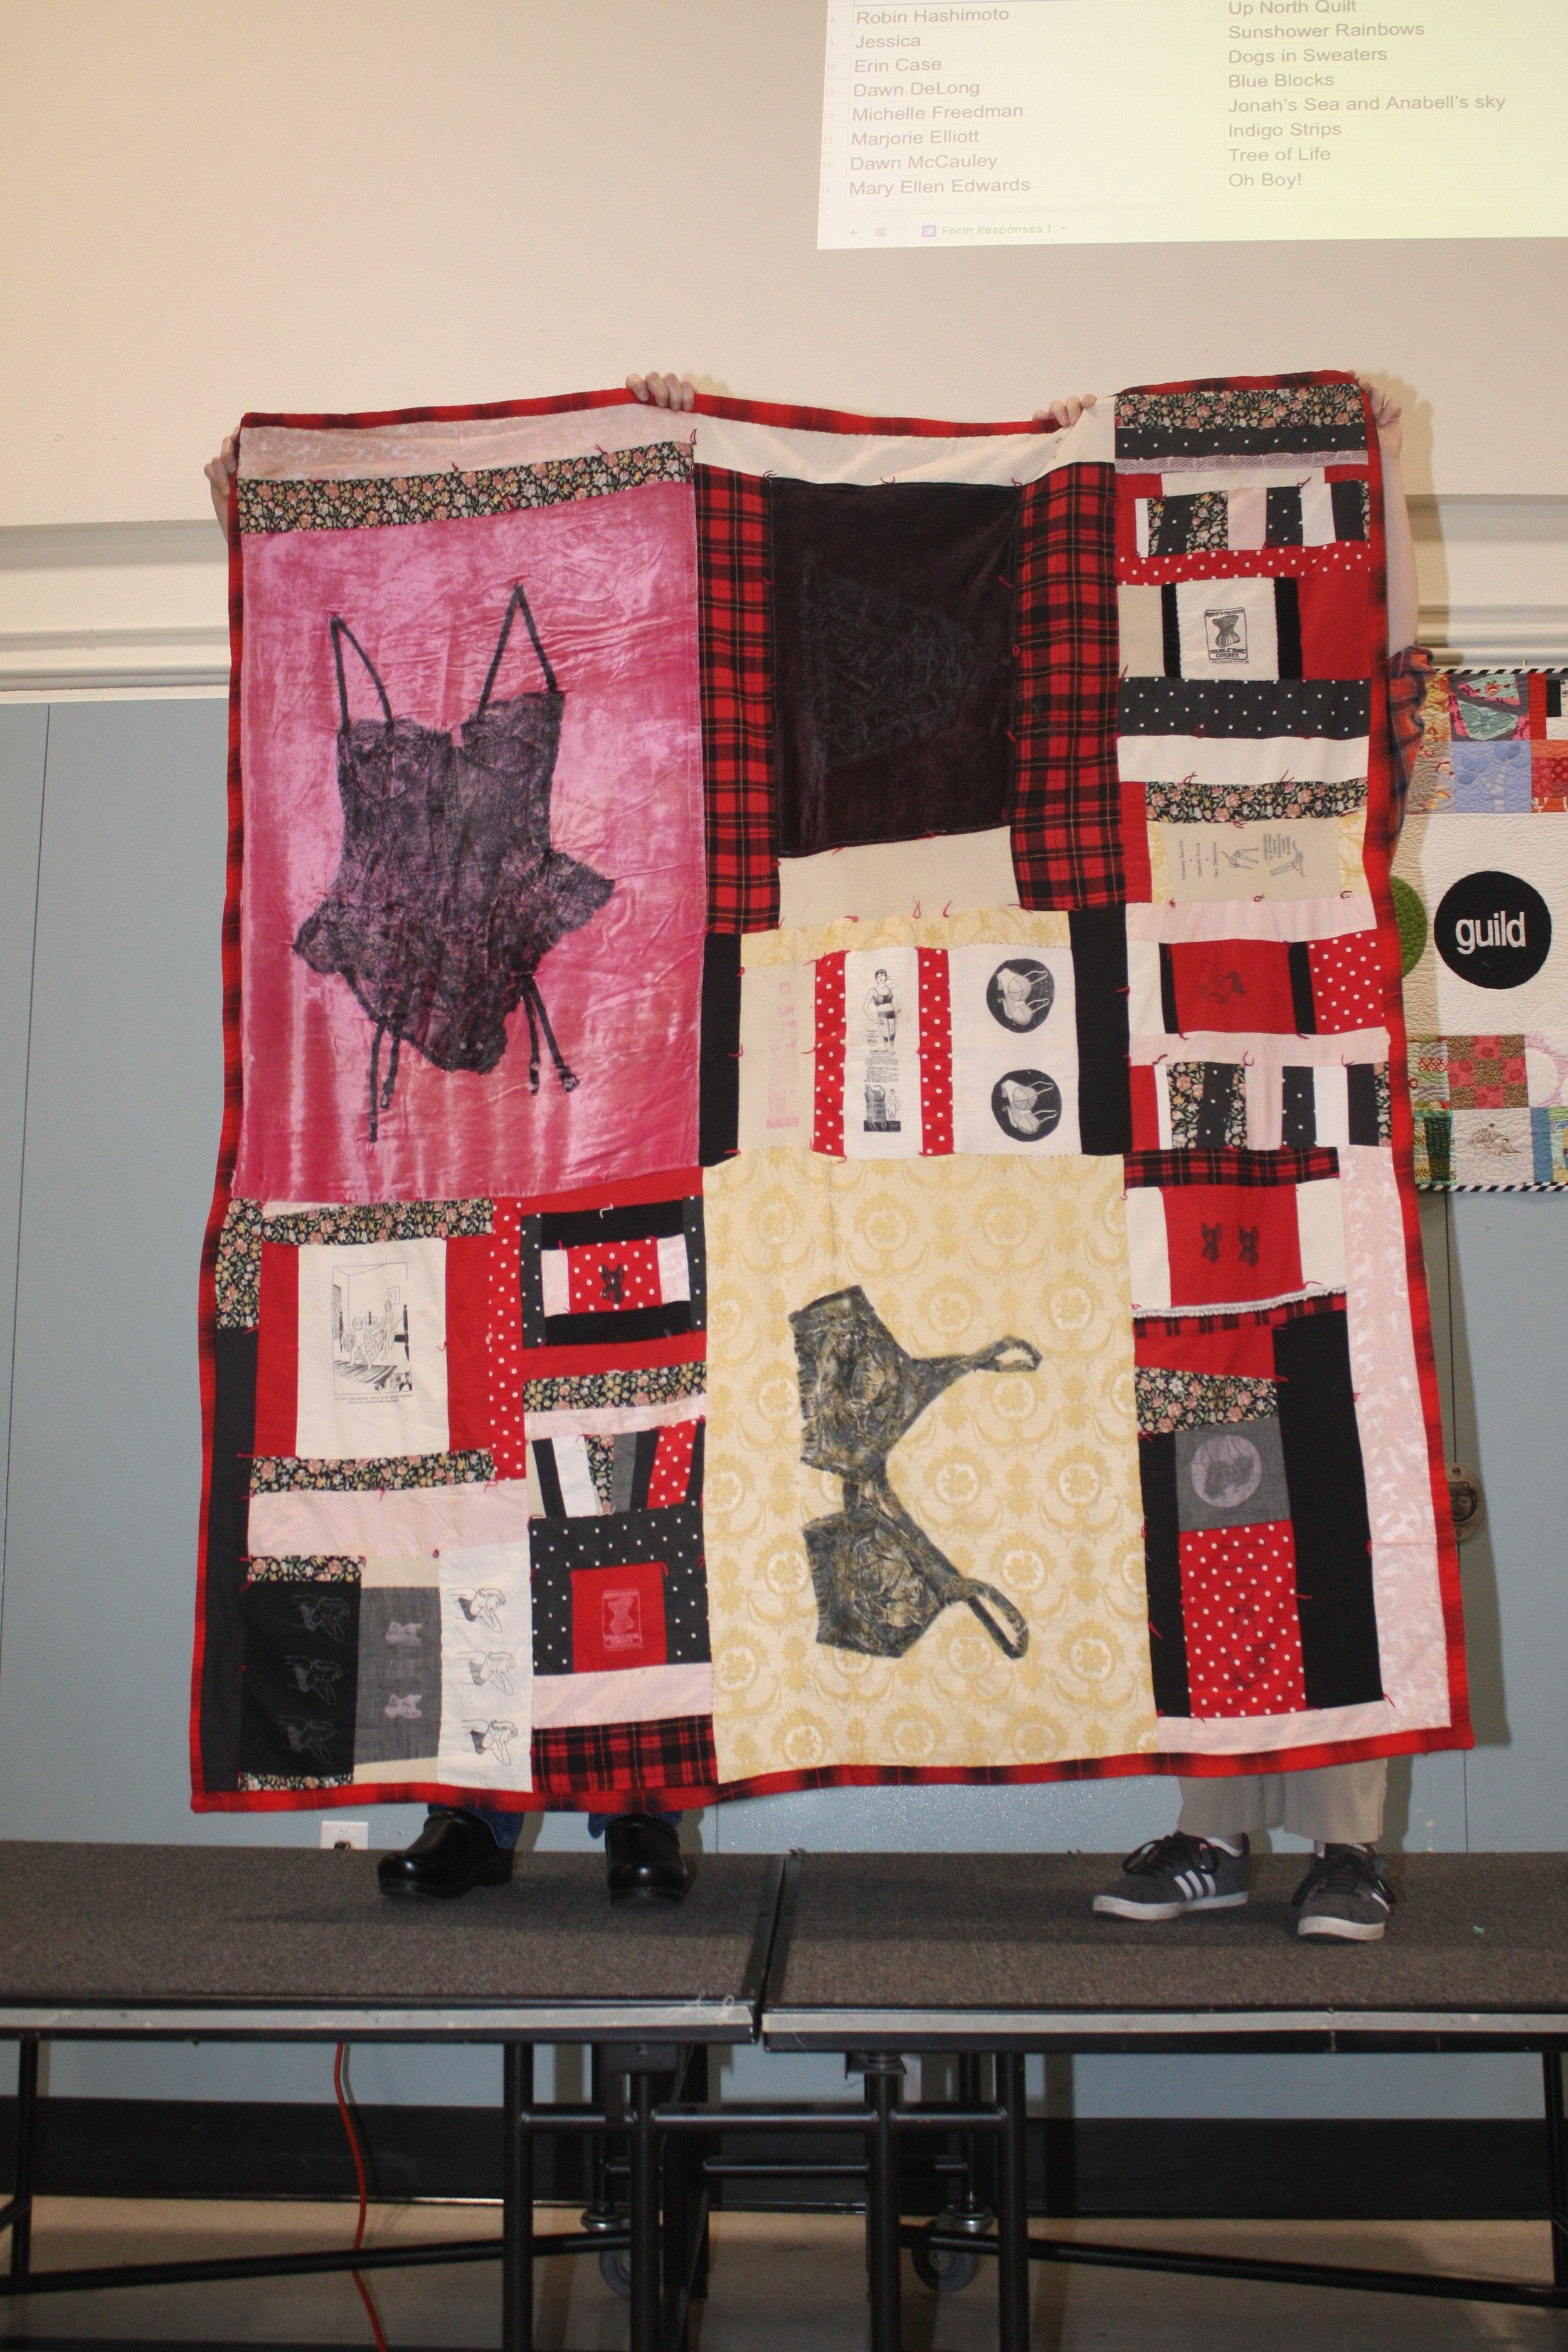 Marci Macfarlane's First Quilt